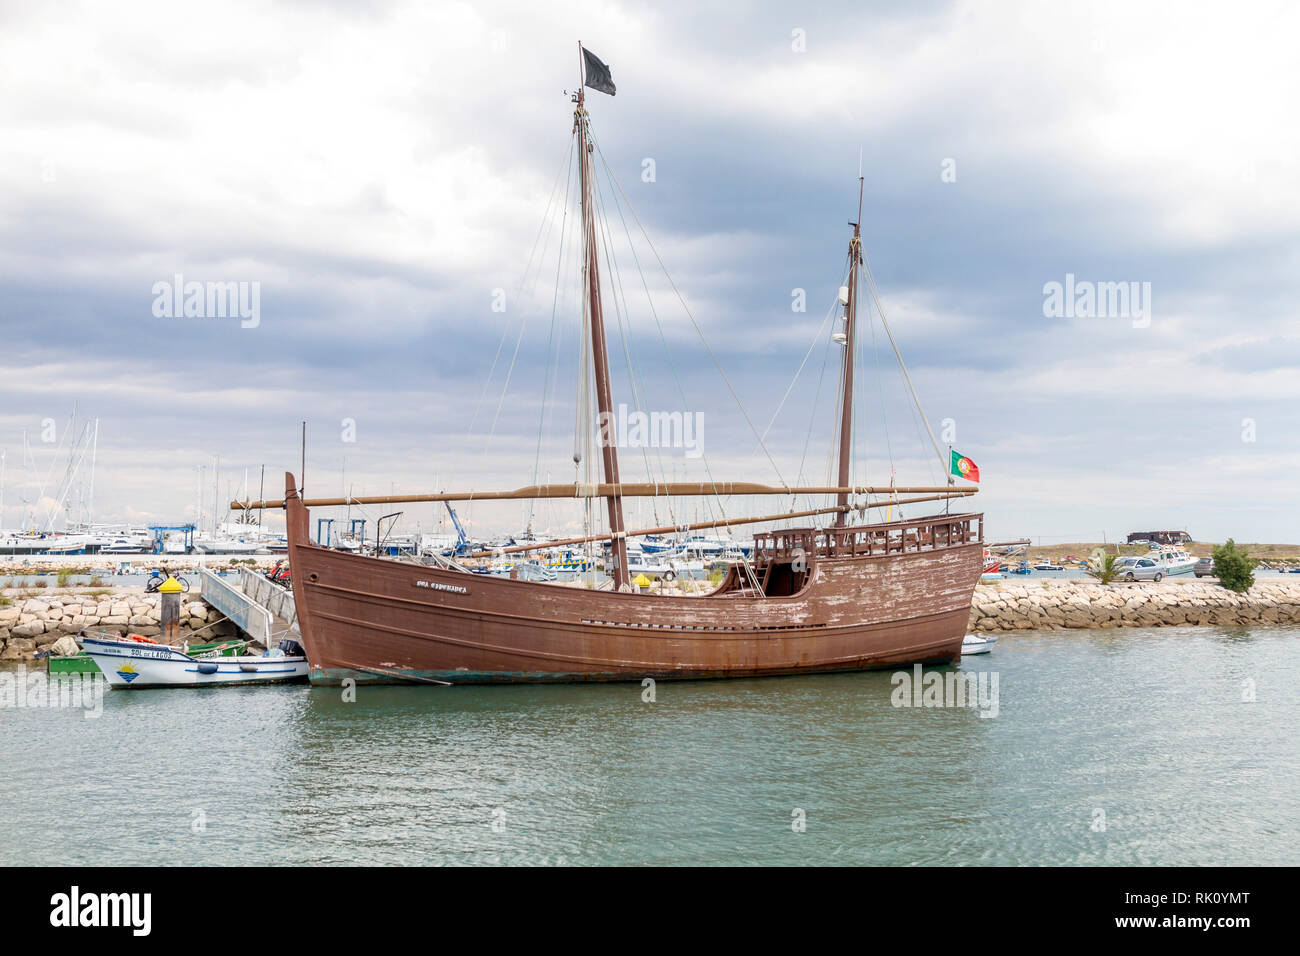 Replica Caravela Latina moored at Lagos, Algarve, Portugal - Stock Image